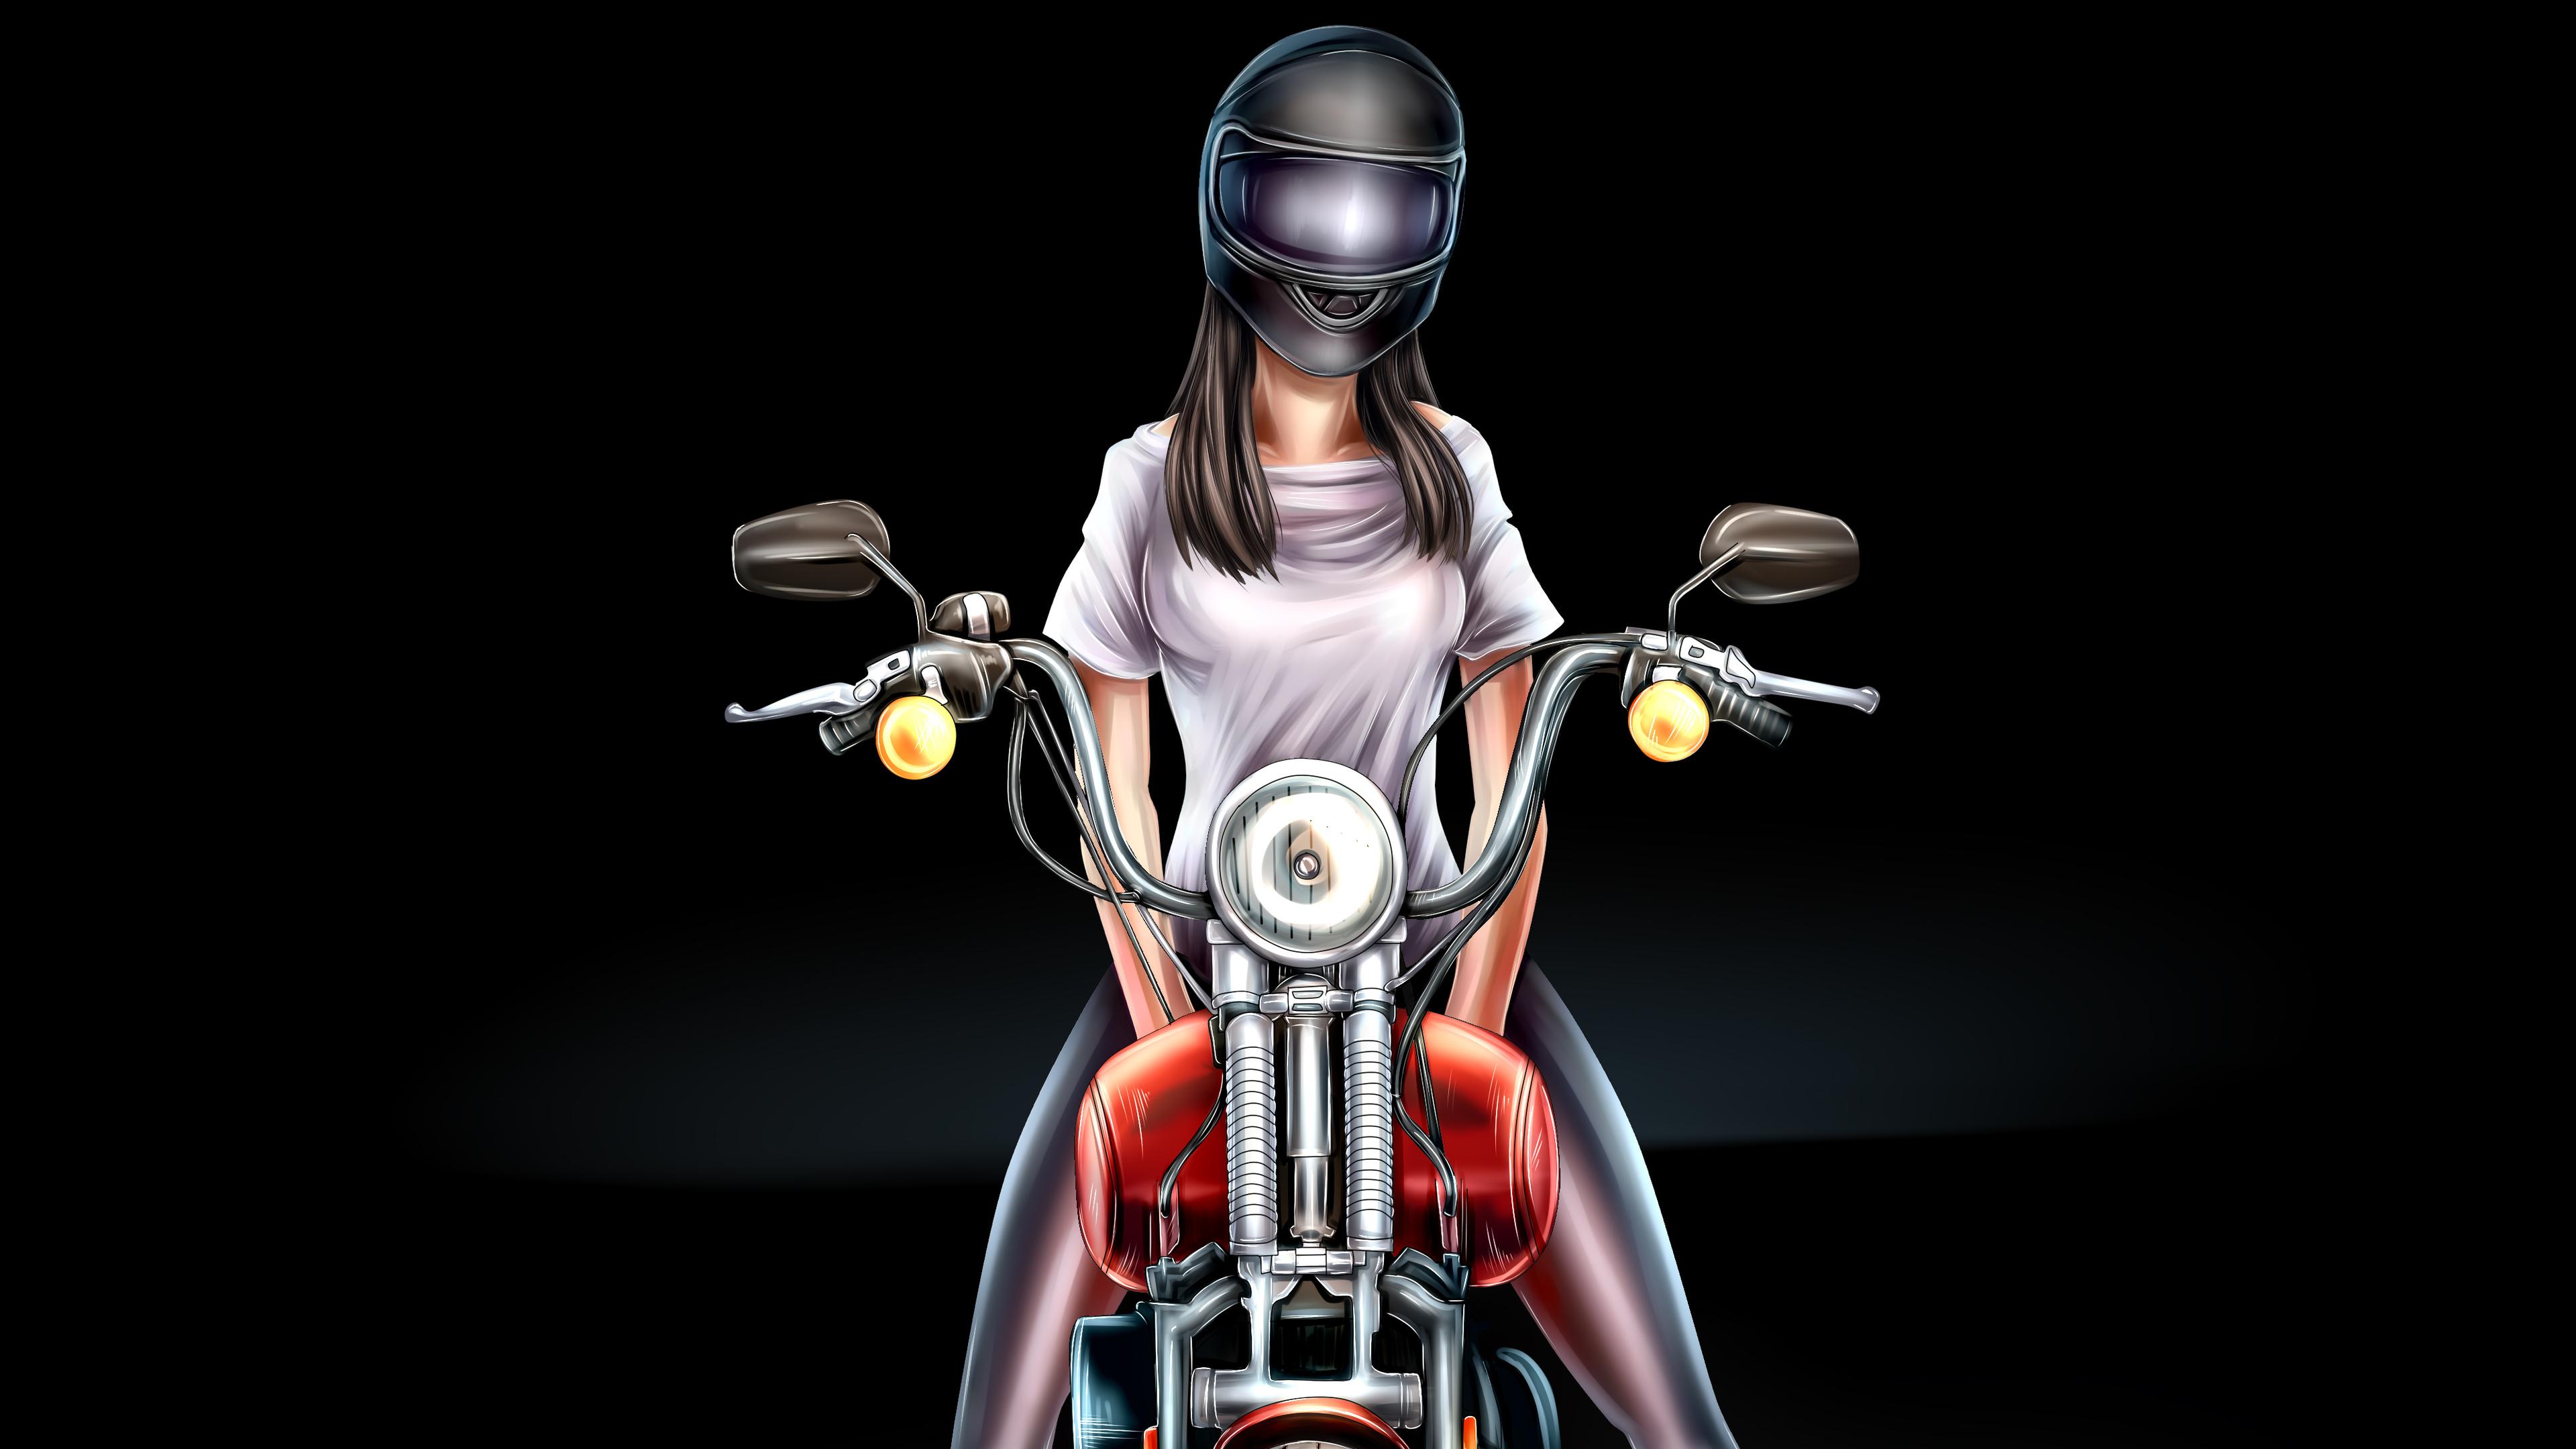 biker-girl-digital-art-4k-kn.jpg